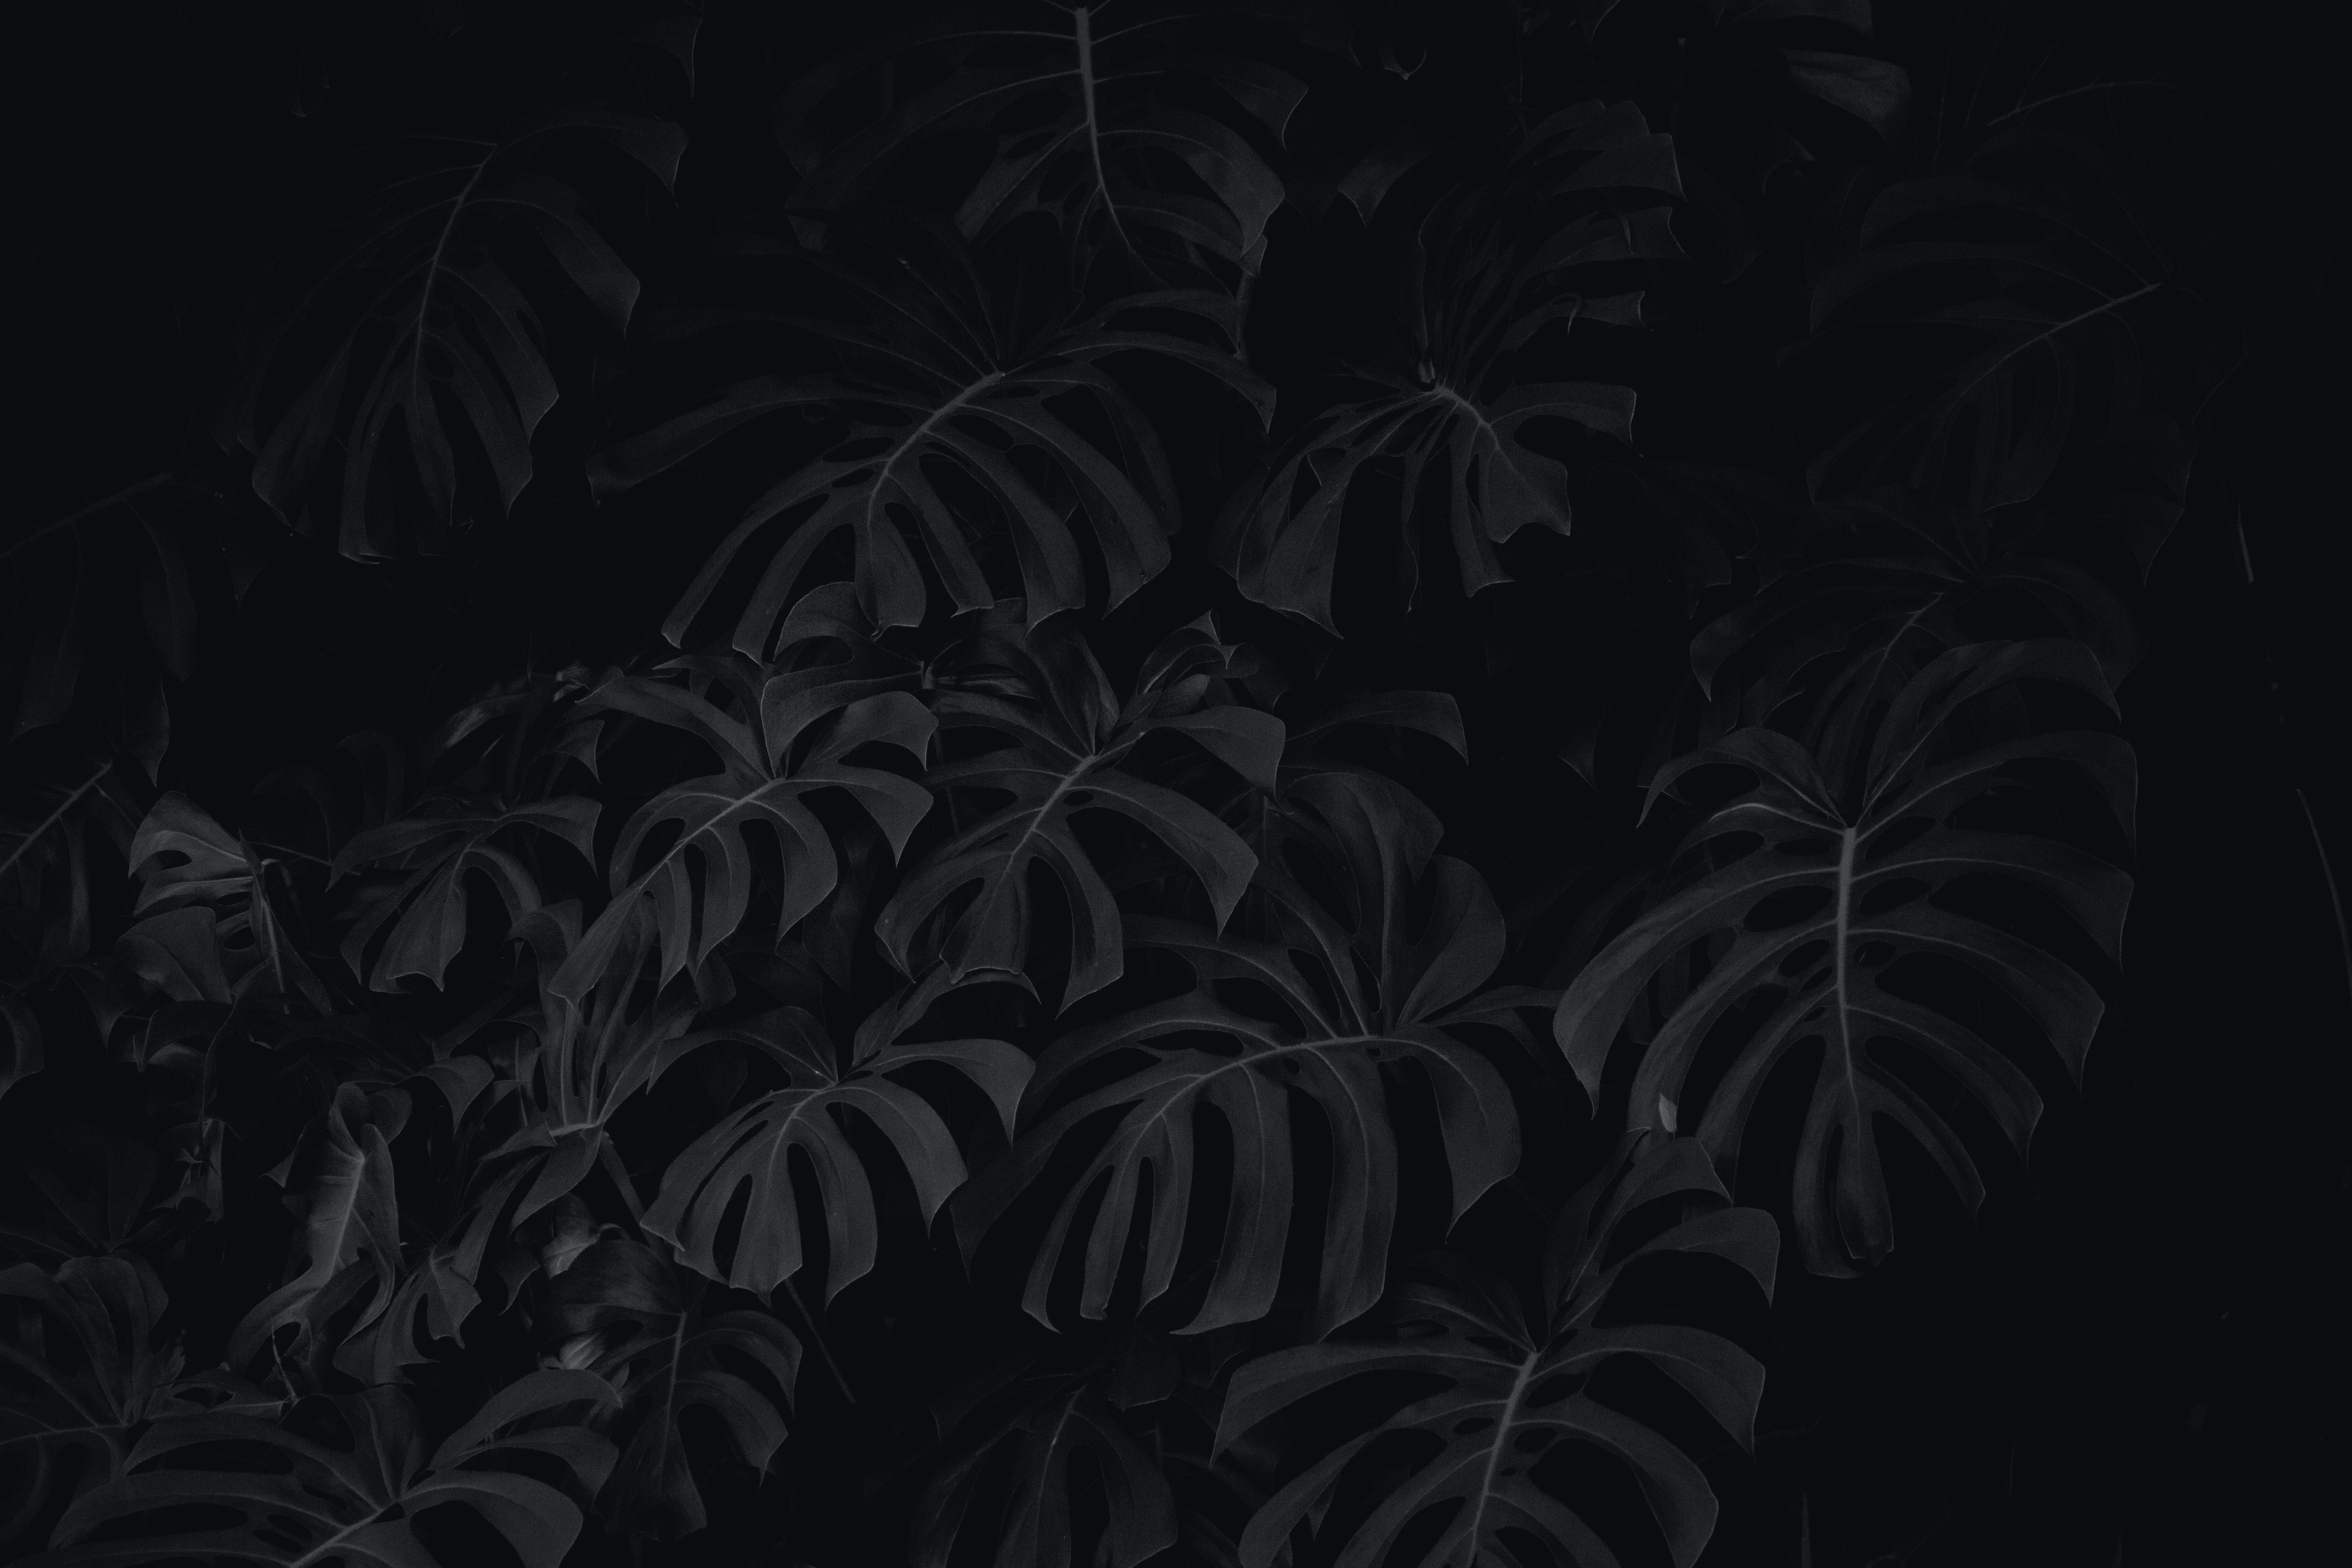 106132 descarga Negro fondos de pantalla para tu teléfono gratis, Hojas, Planta, Bw, Chb Negro imágenes y protectores de pantalla para tu teléfono